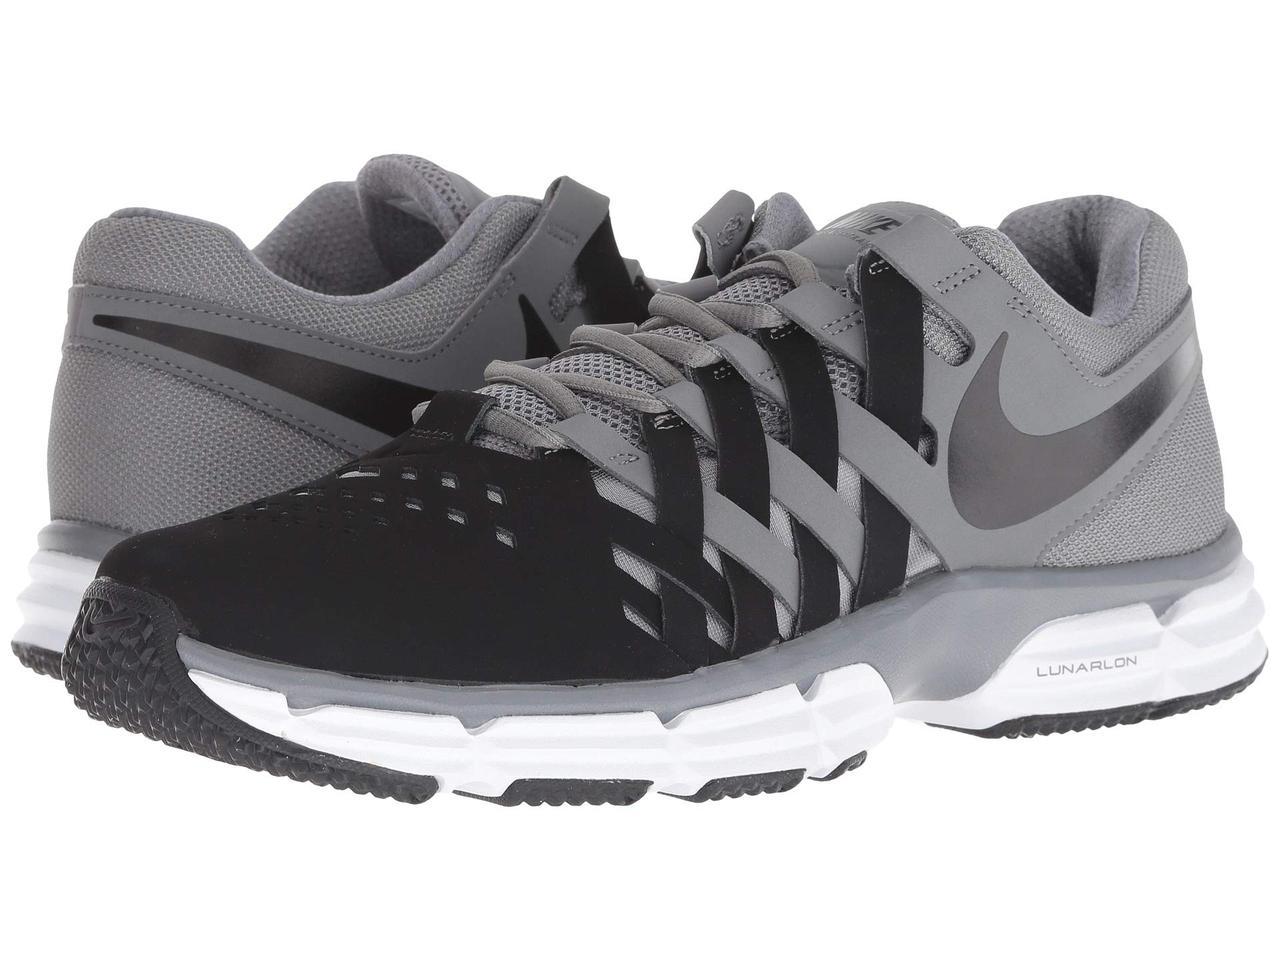 5d24e65fac41 Кроссовки Кеды (Оригинал) Nike Lunar Fingertrap TR Cool Grey Black - TopUSA